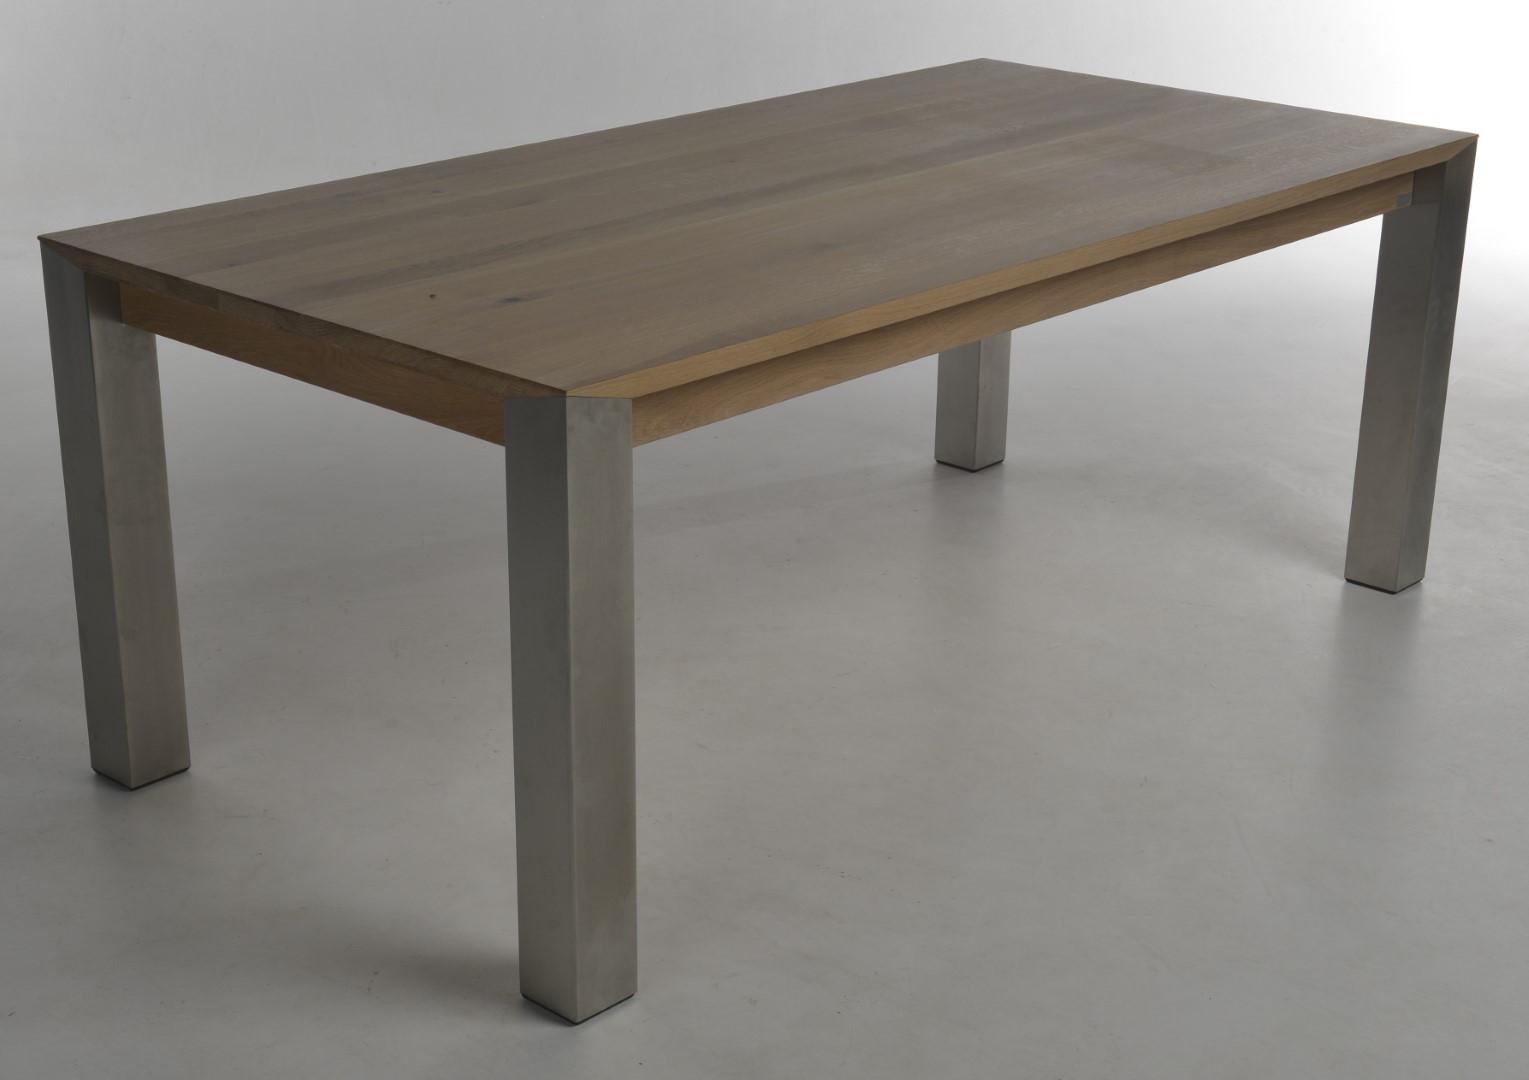 cyano eettafel bert plantagie outlet. Black Bedroom Furniture Sets. Home Design Ideas